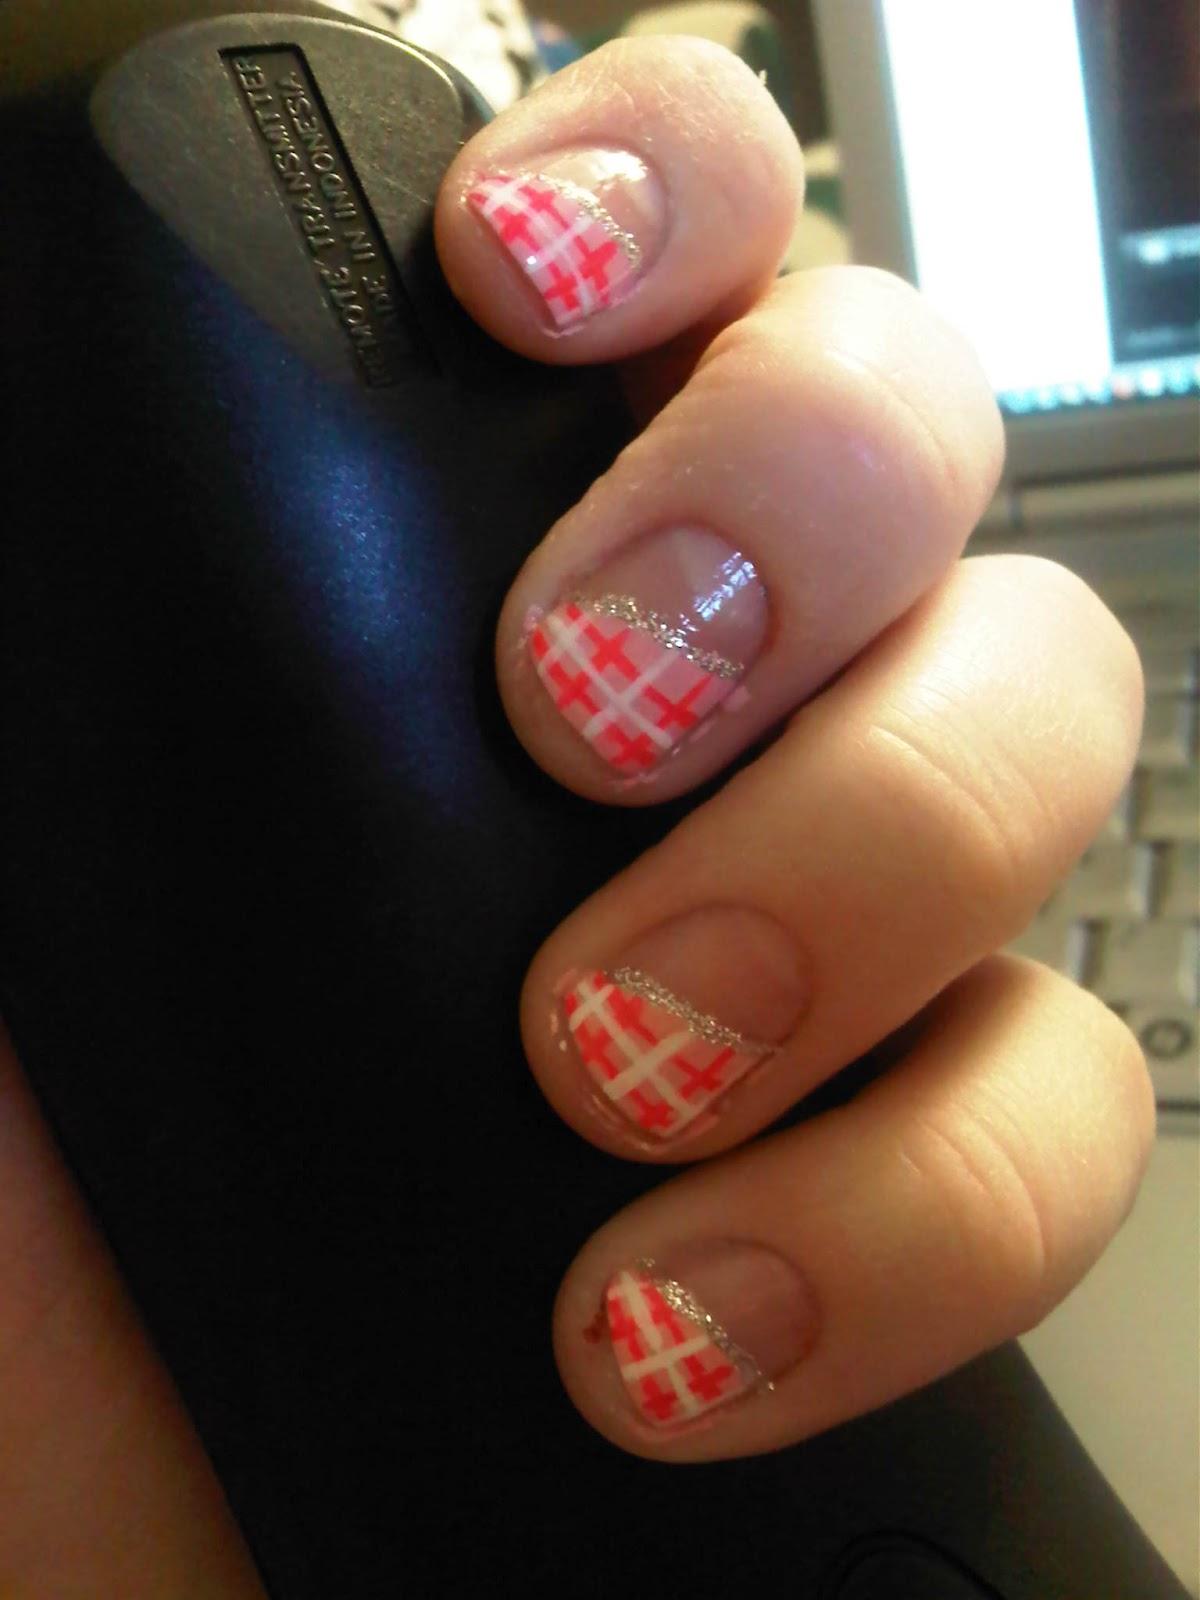 bekk 39 s beauty blurbs notd valentine 39 s day nails and a little nail guru lovin 39